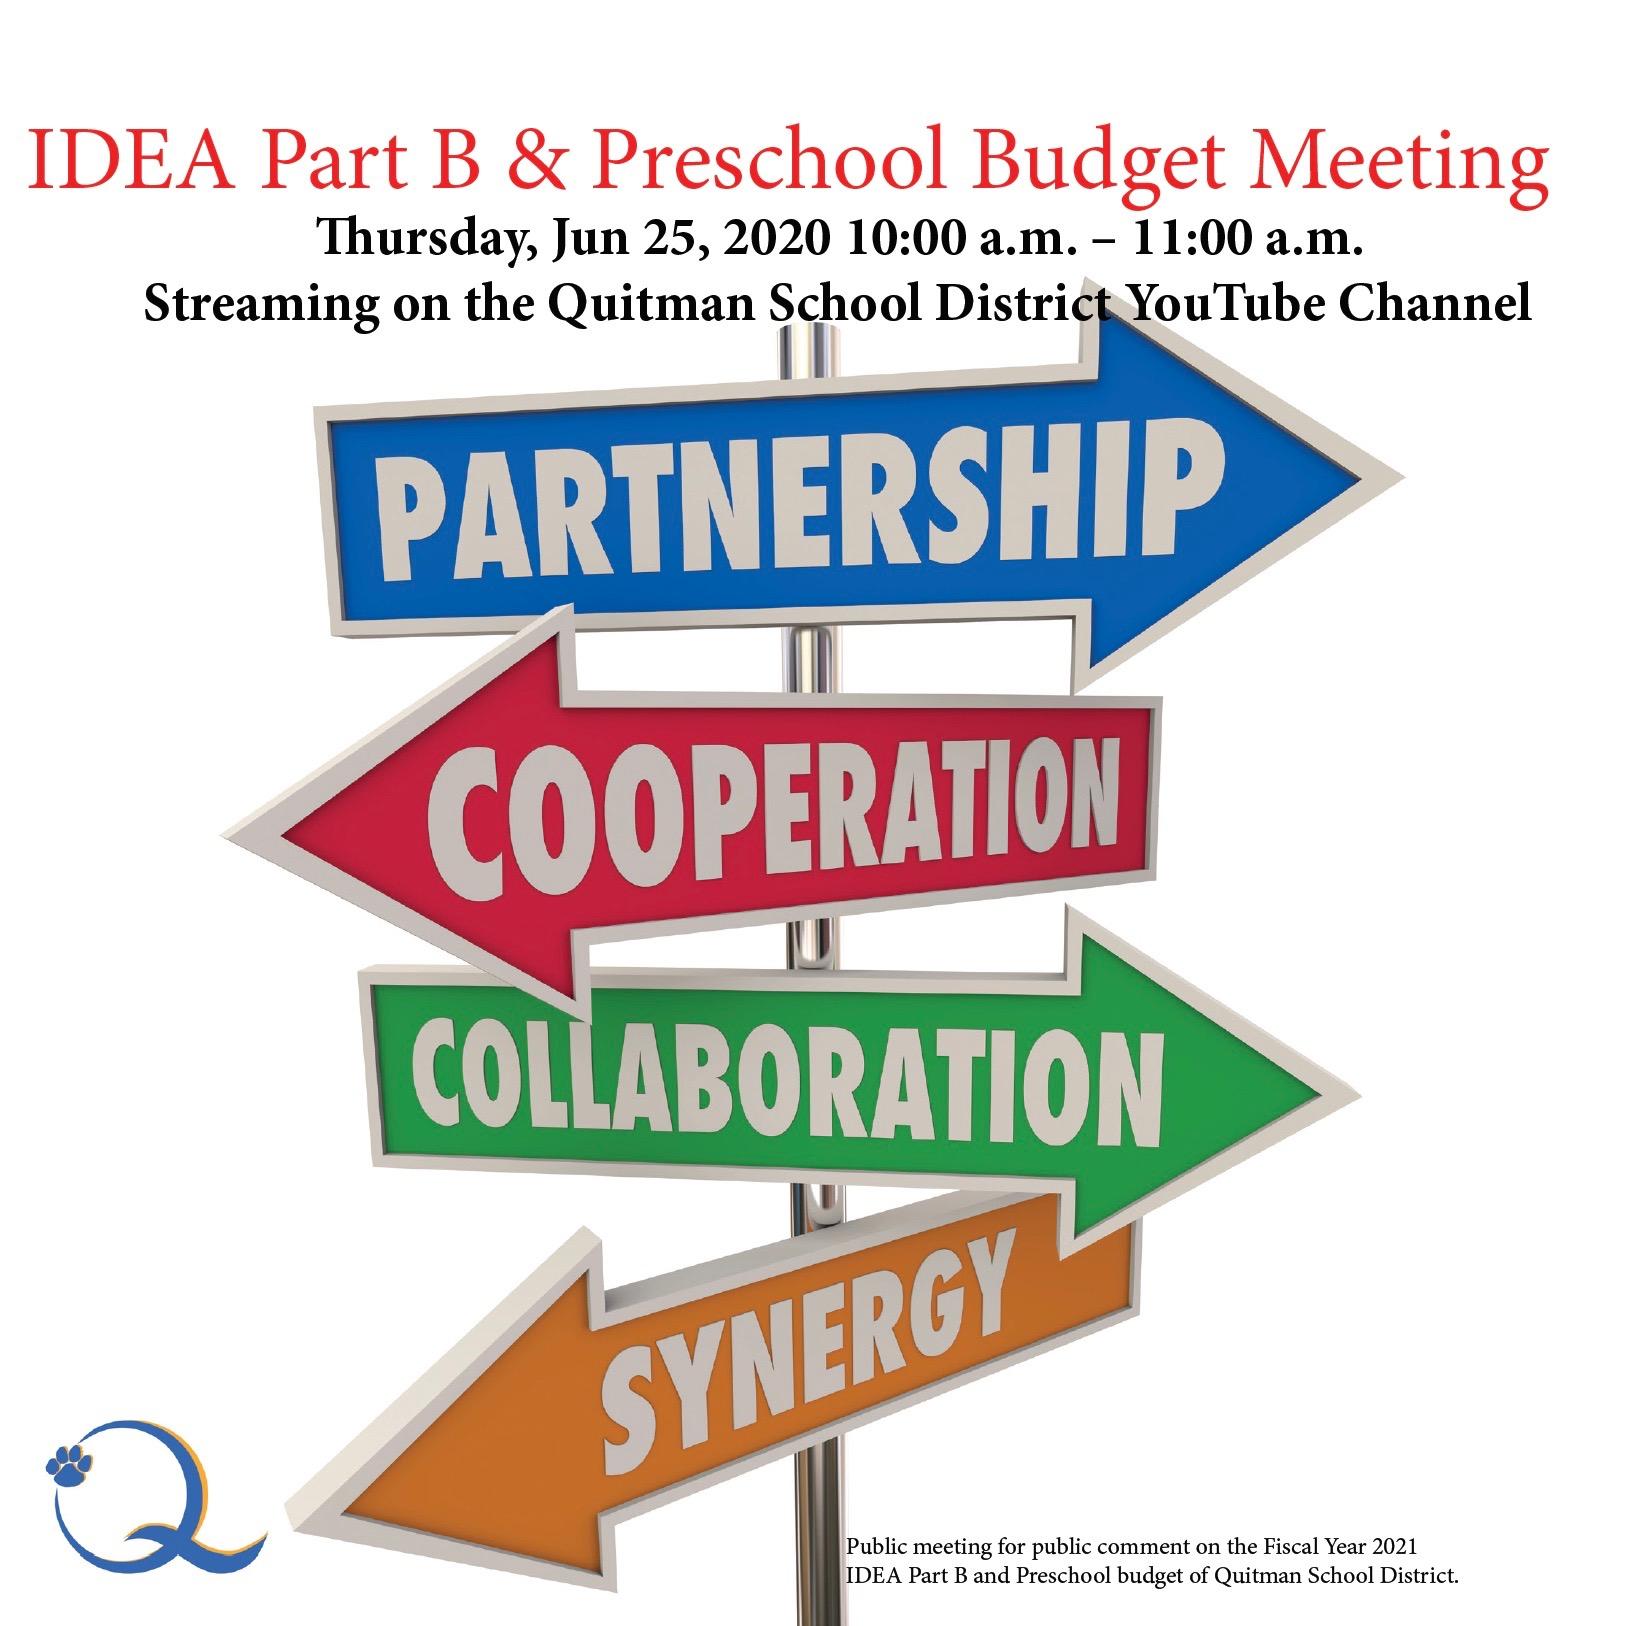 This is a screenshot describing the IDEA Part B Preschool Budget Meeting.